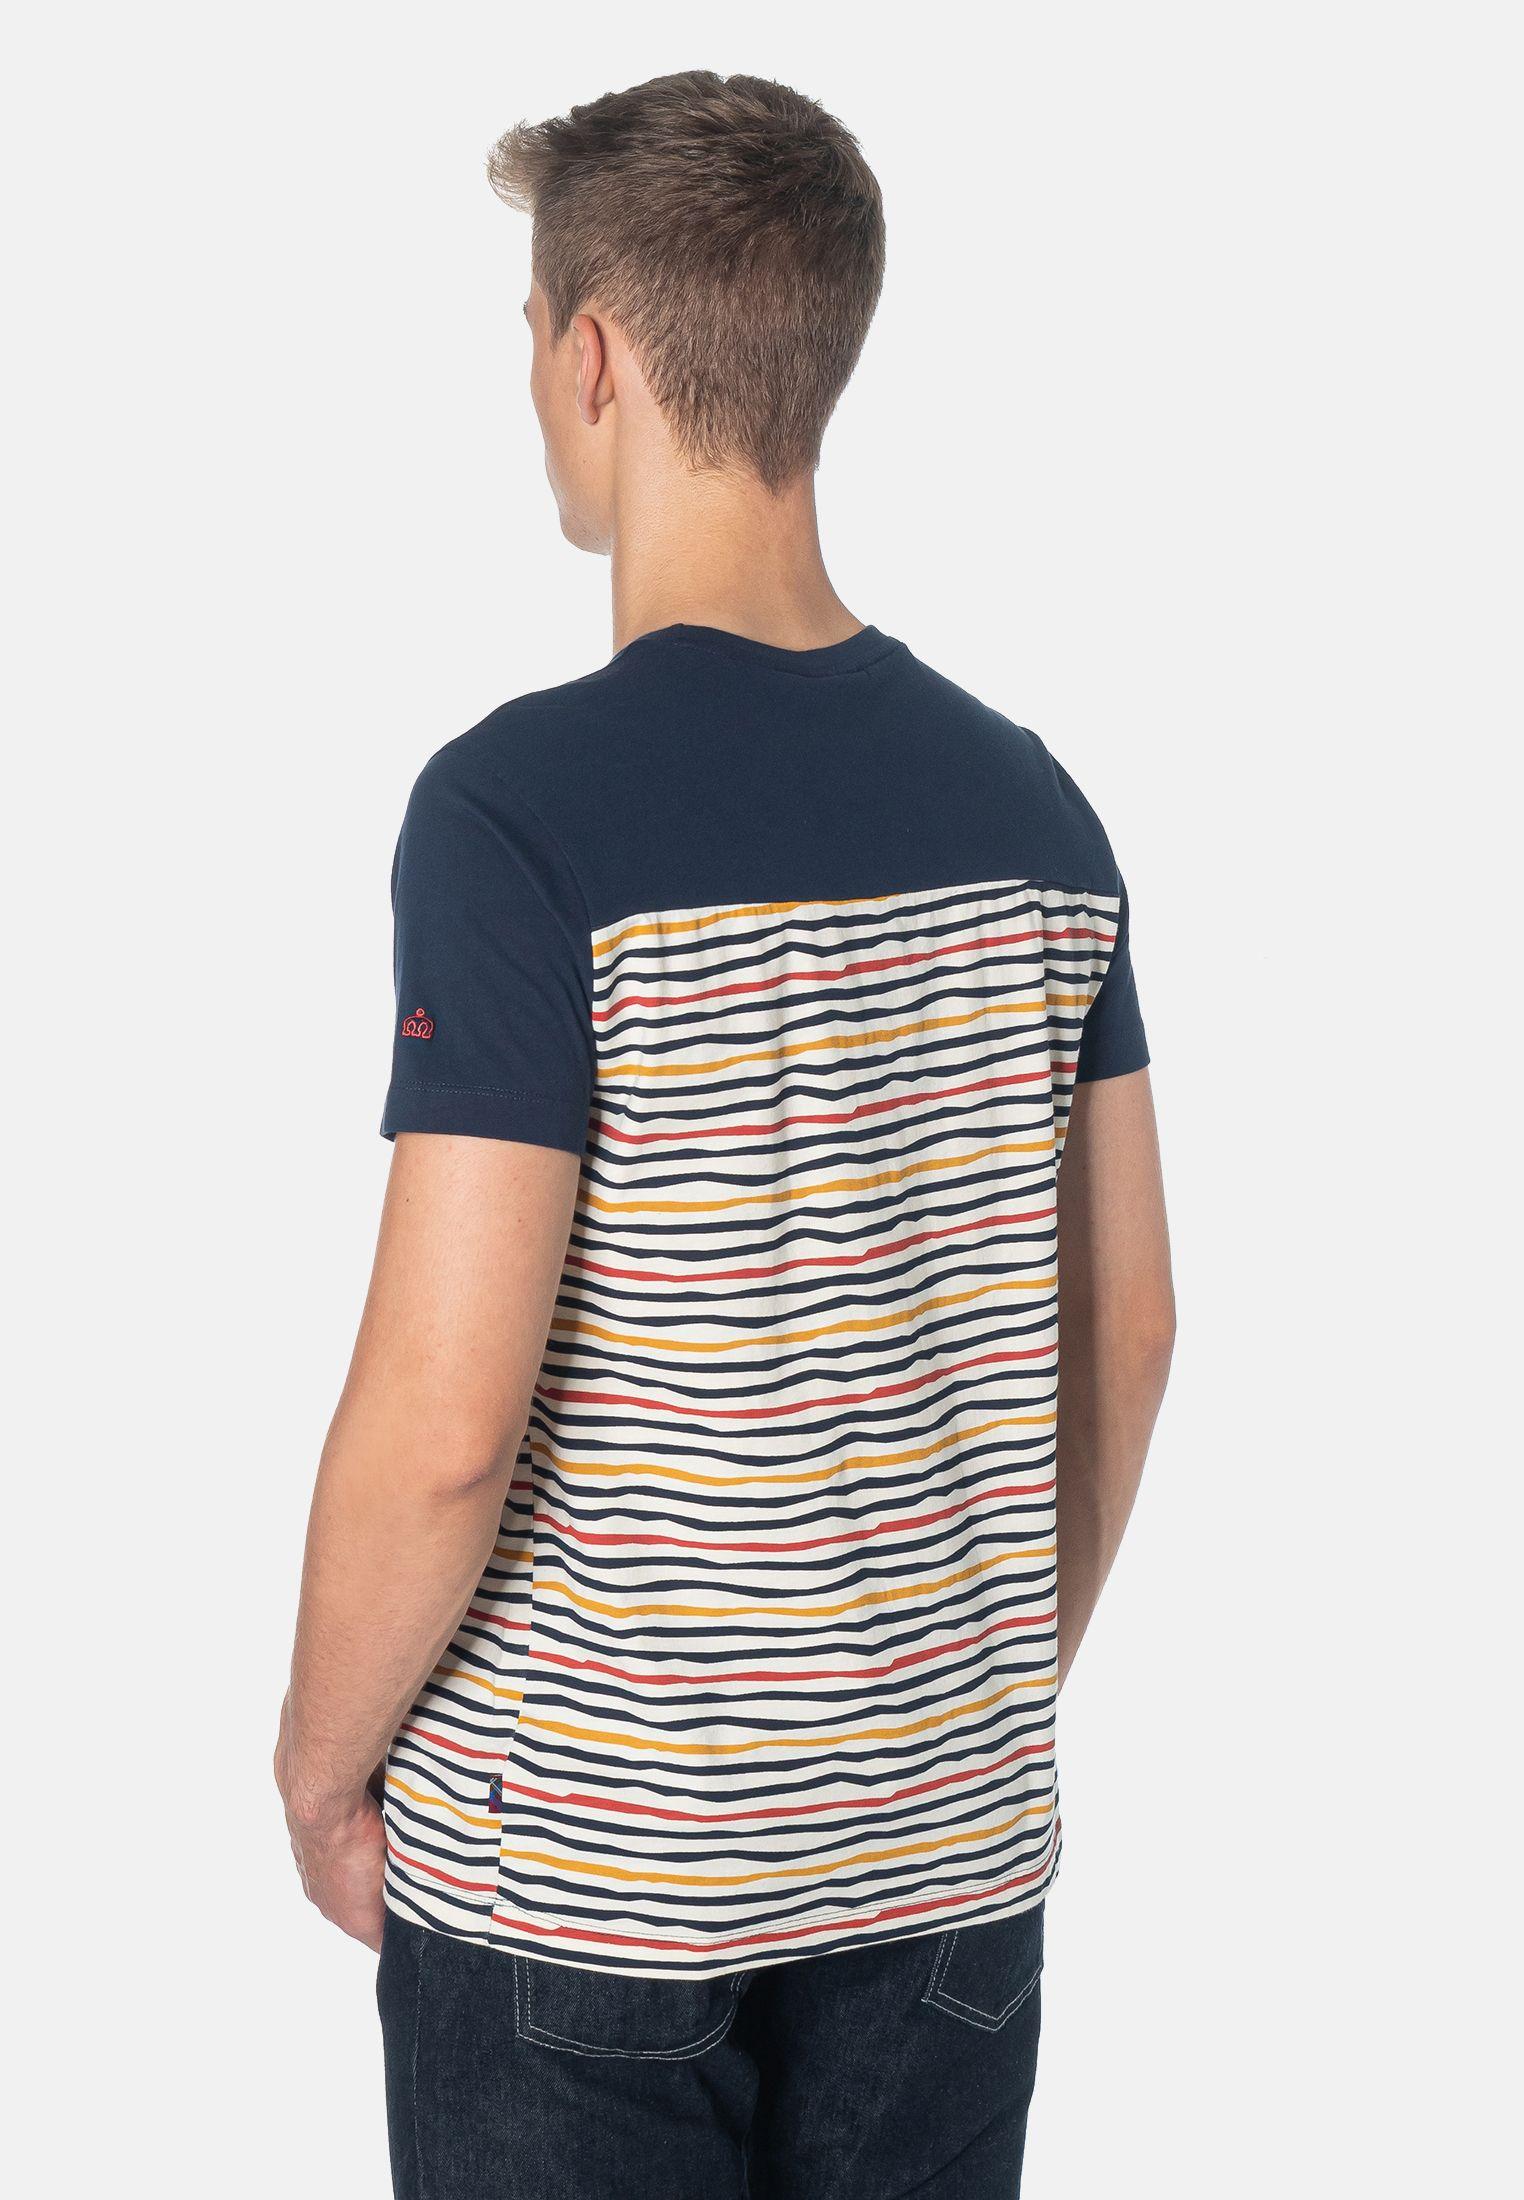 Bowman Multi Colour Stripes Men's T-Shirt in Navy